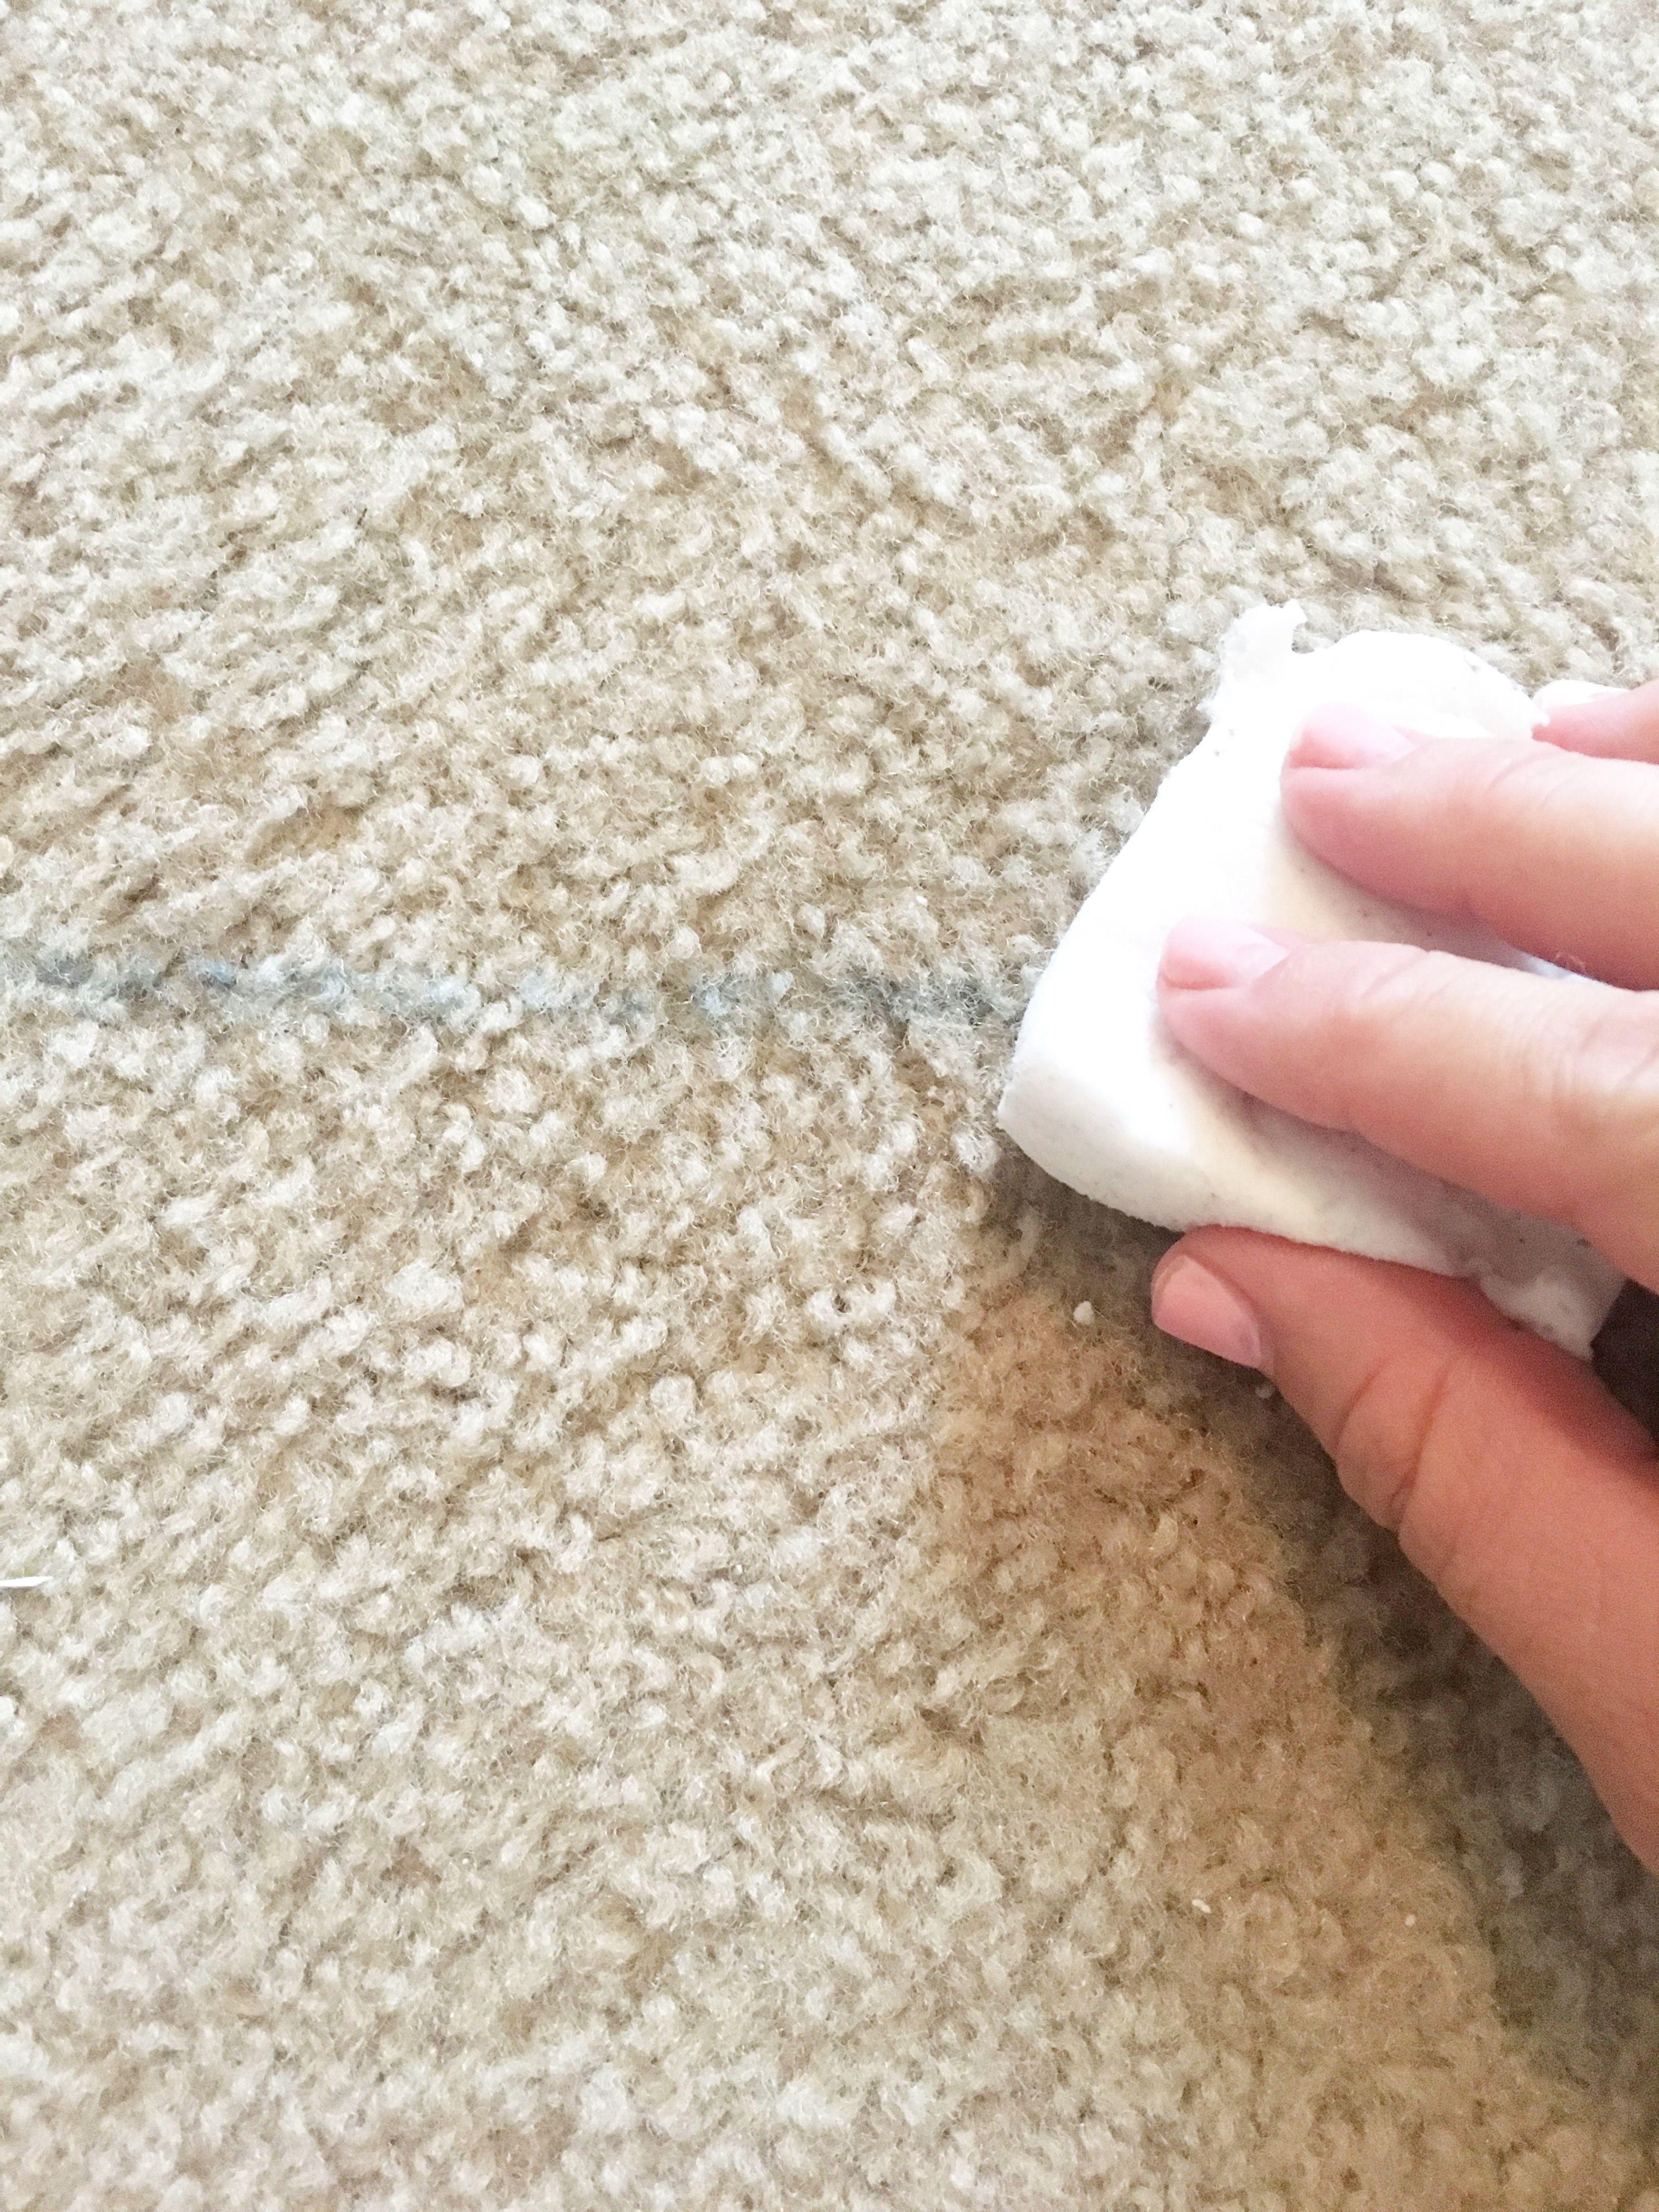 How To Clean Crayon Marks Off Carpet Carpet Vidalondon